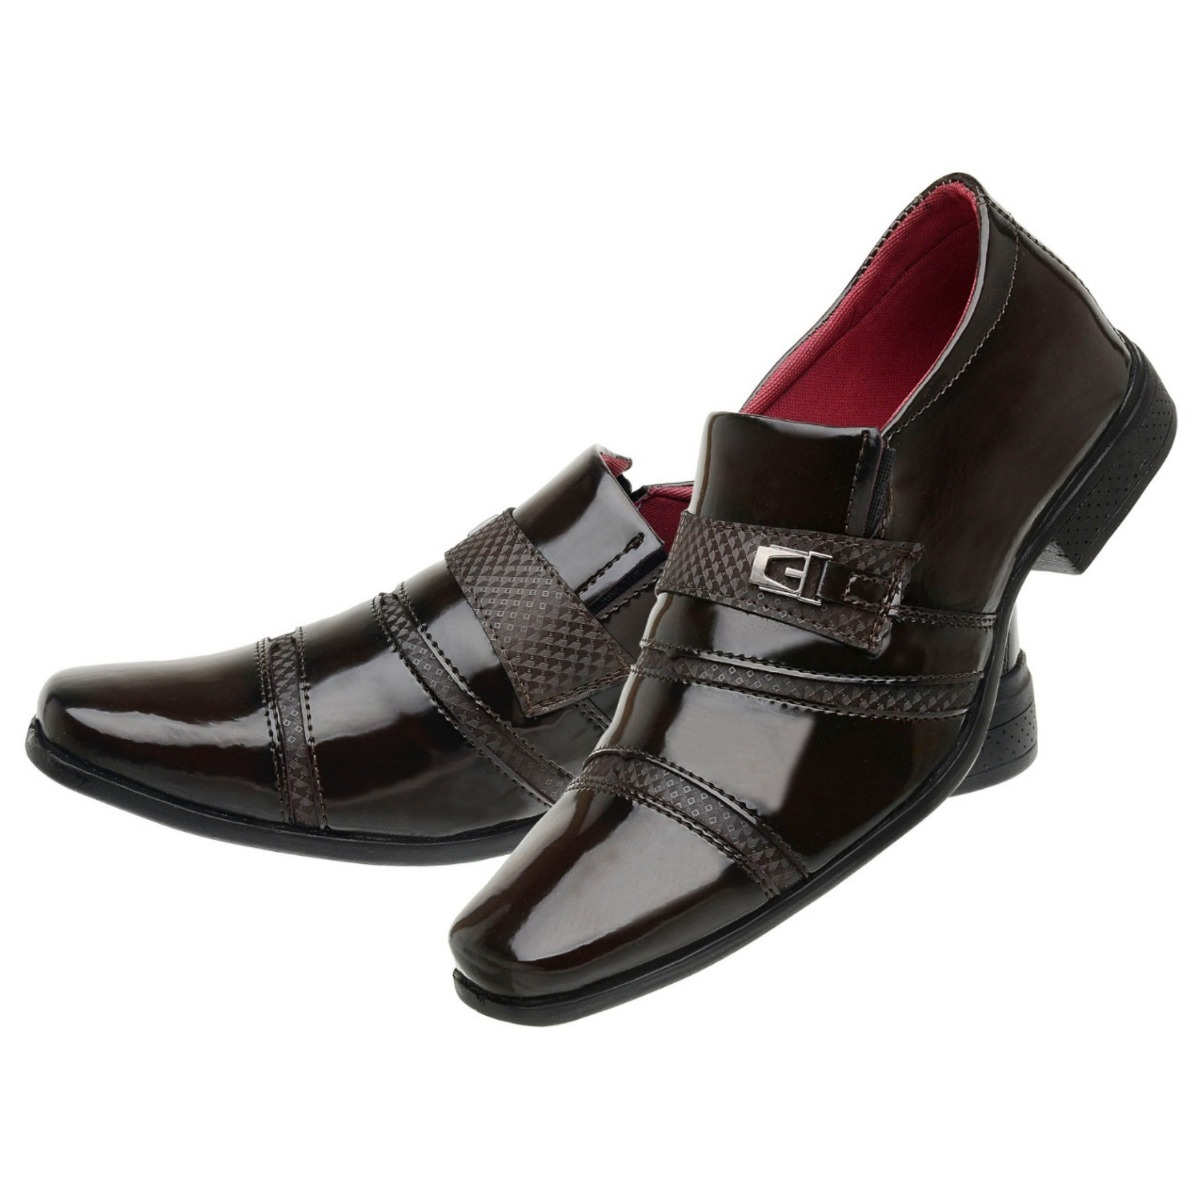 0e931f56f0 Sapato Social Masculino Kit3 Pares Promoção Imperdivel - R  100